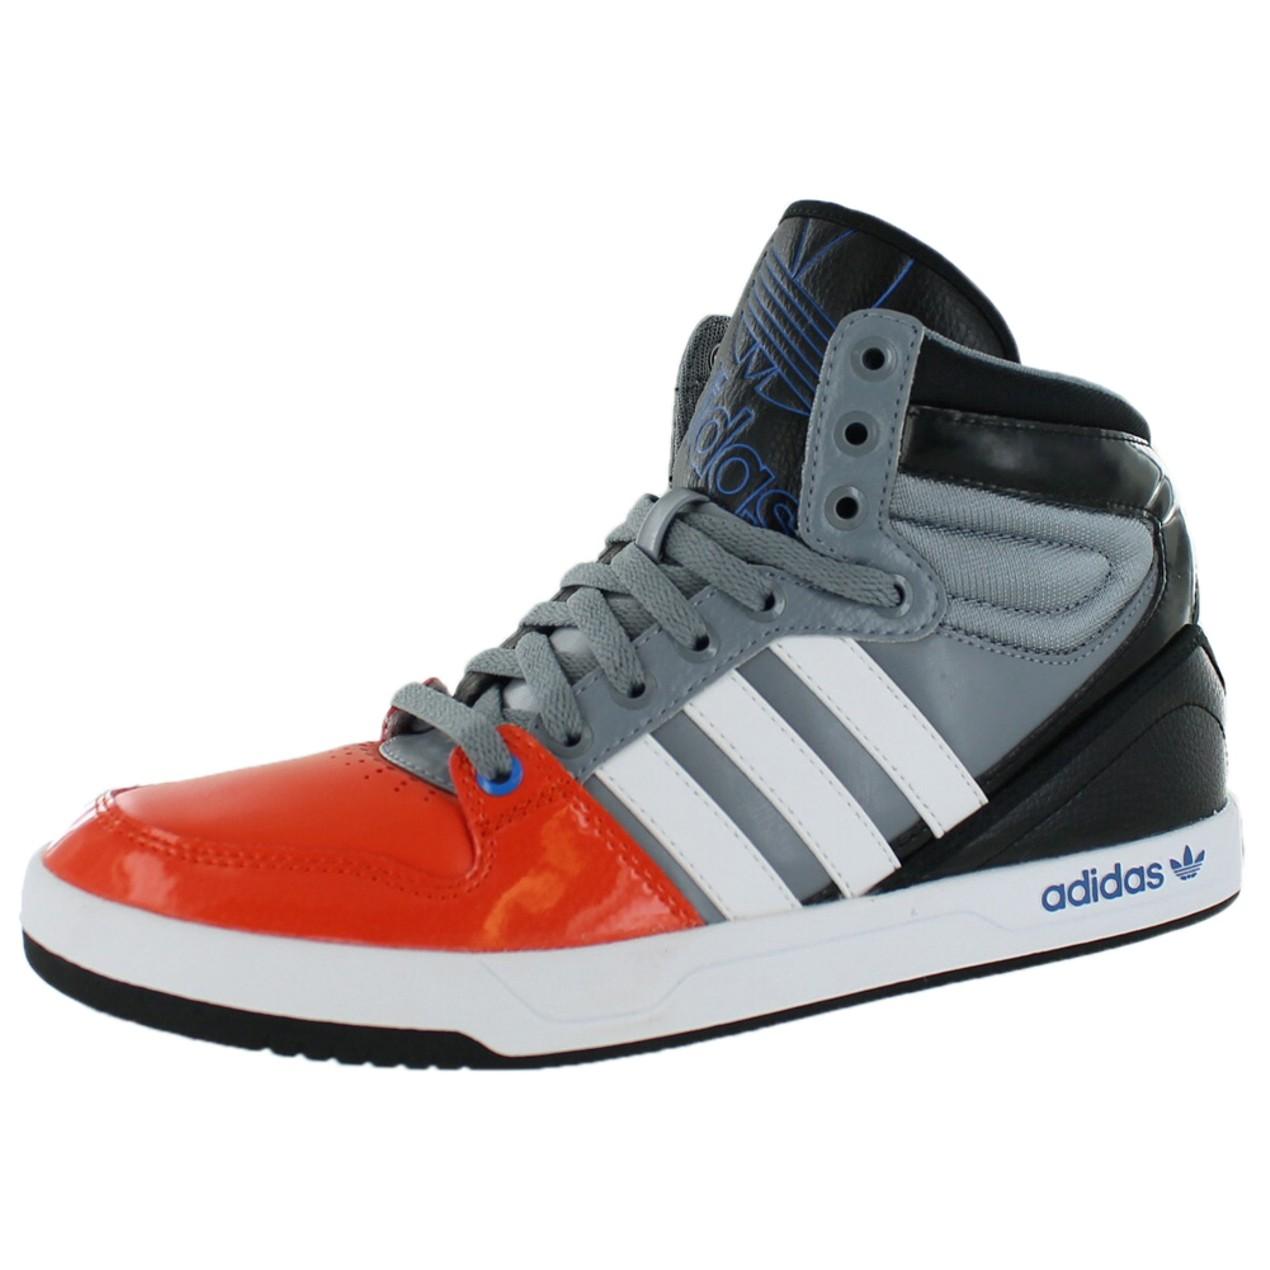 newest collection 34b70 3729d ... Adidas Adi Originals Mens Court Attitude Sneakers